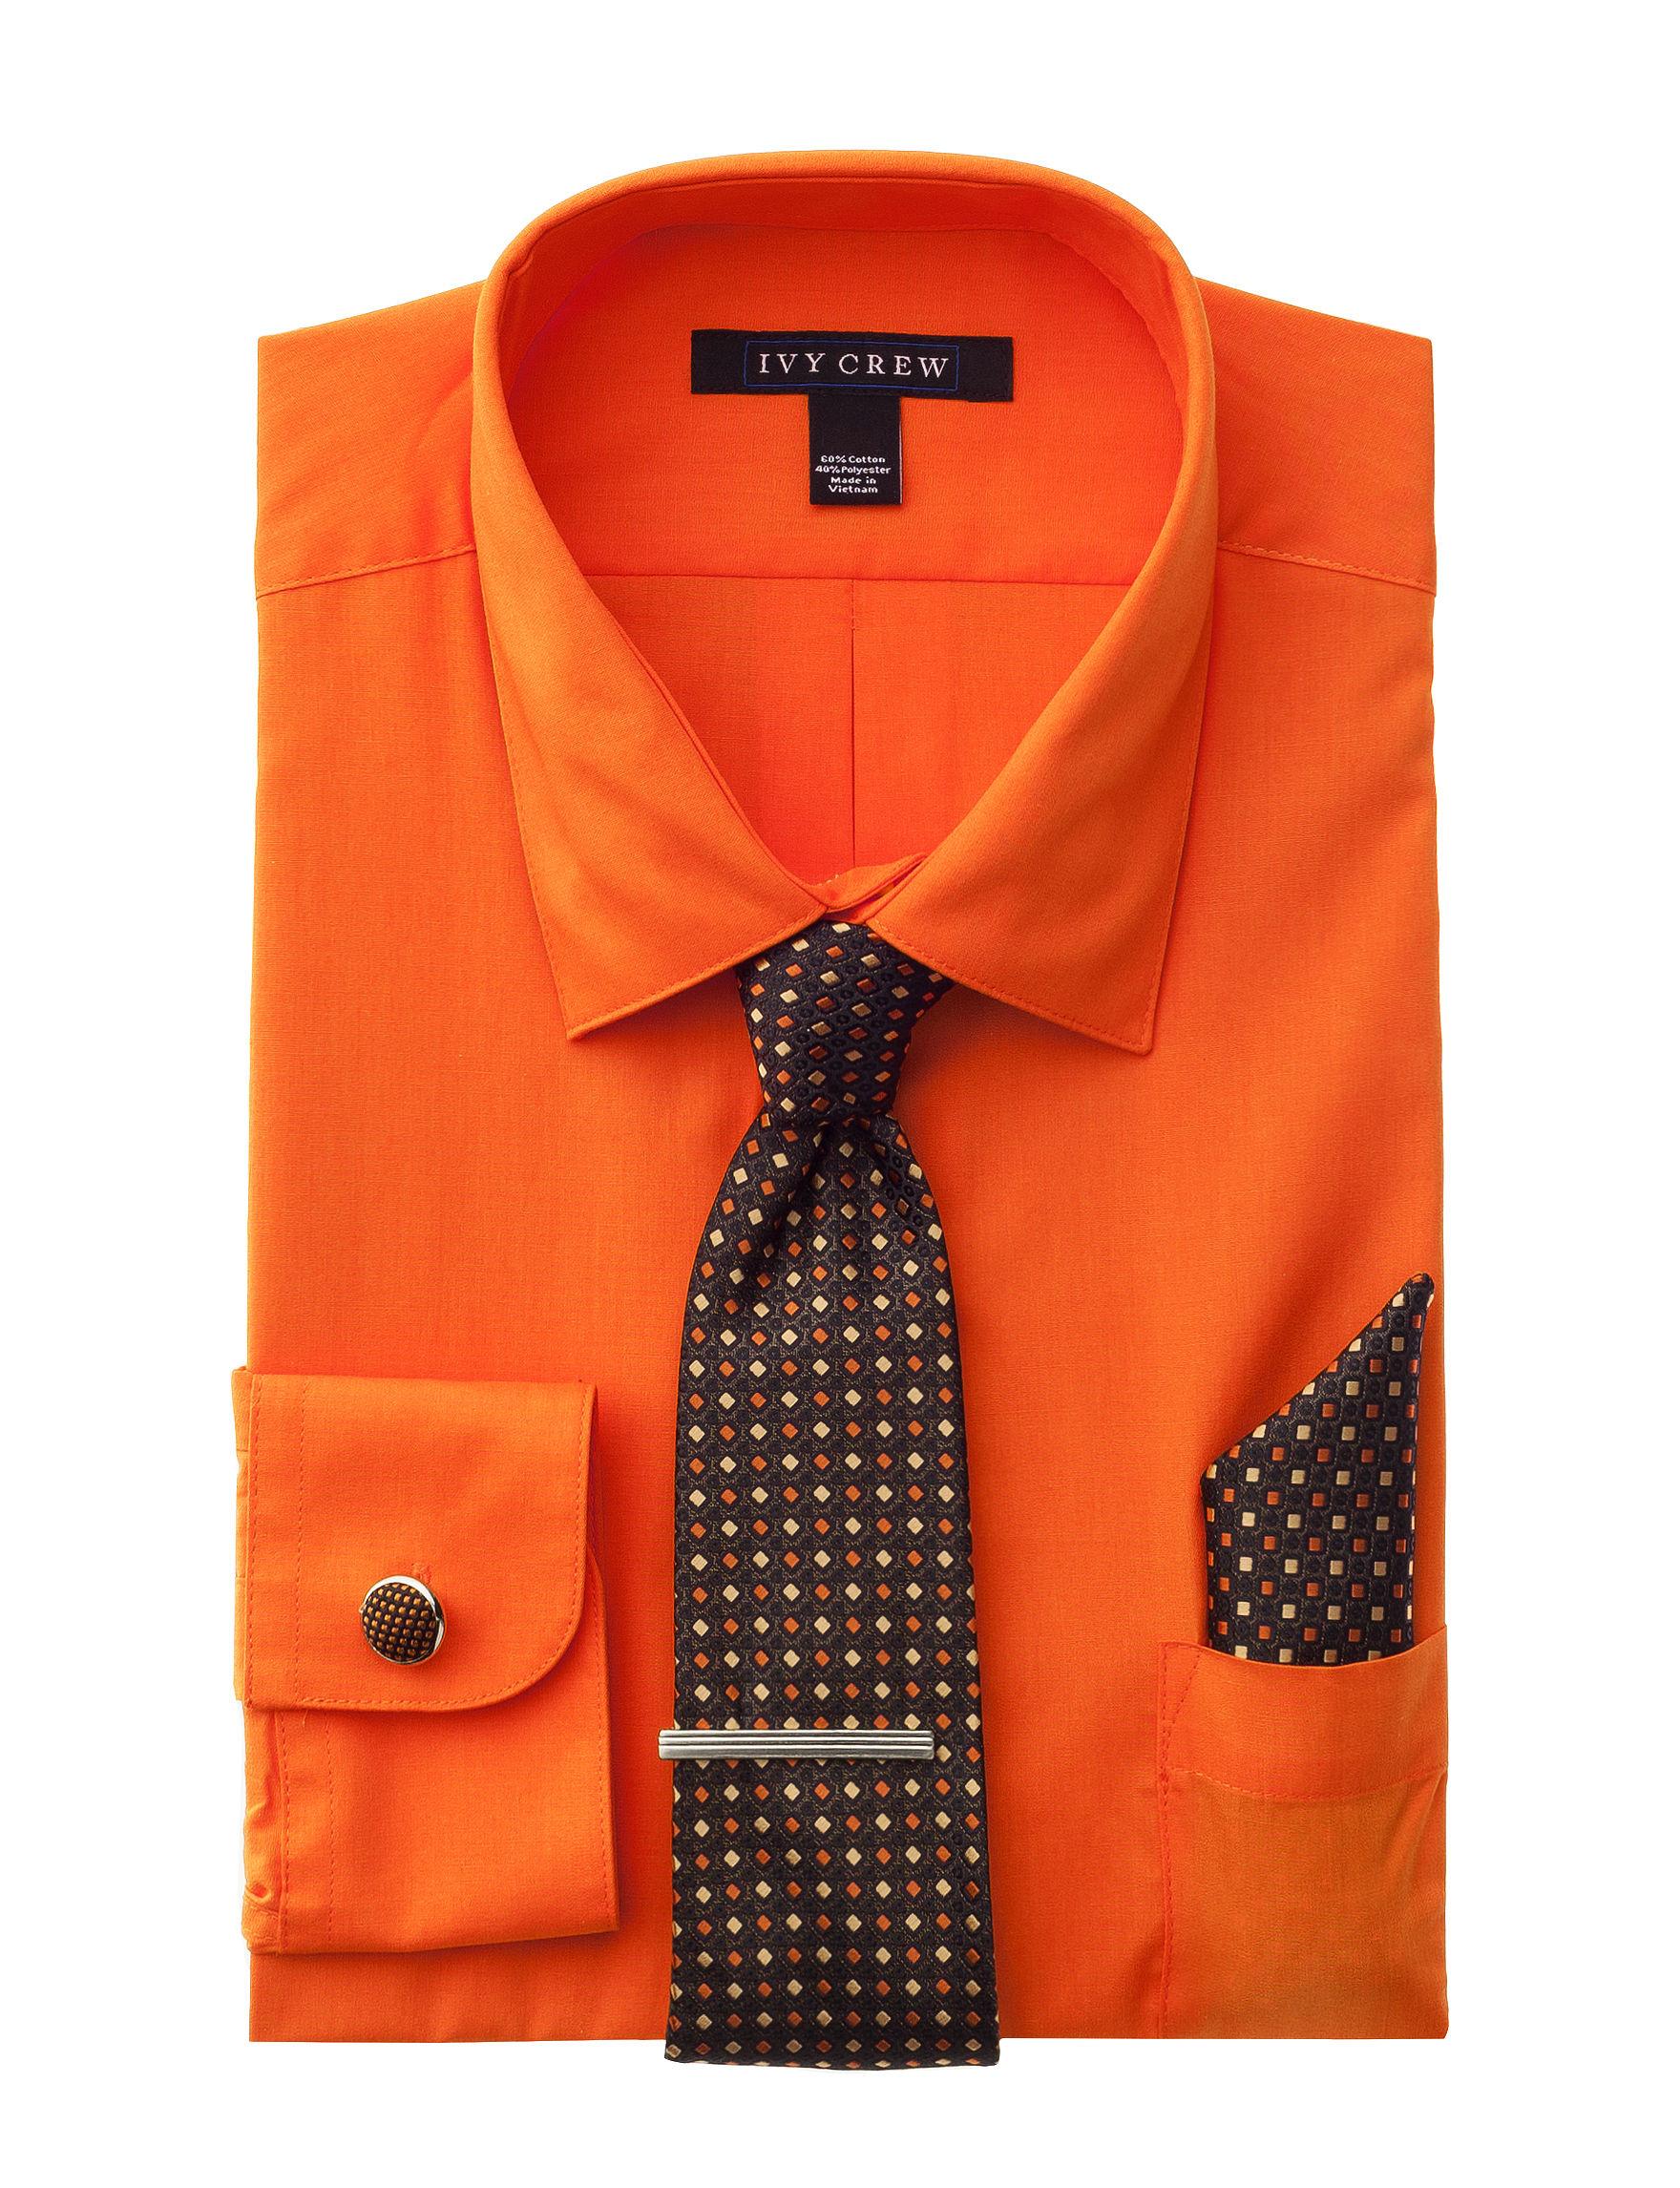 Ivy Crew Mandarin Dress Shirts